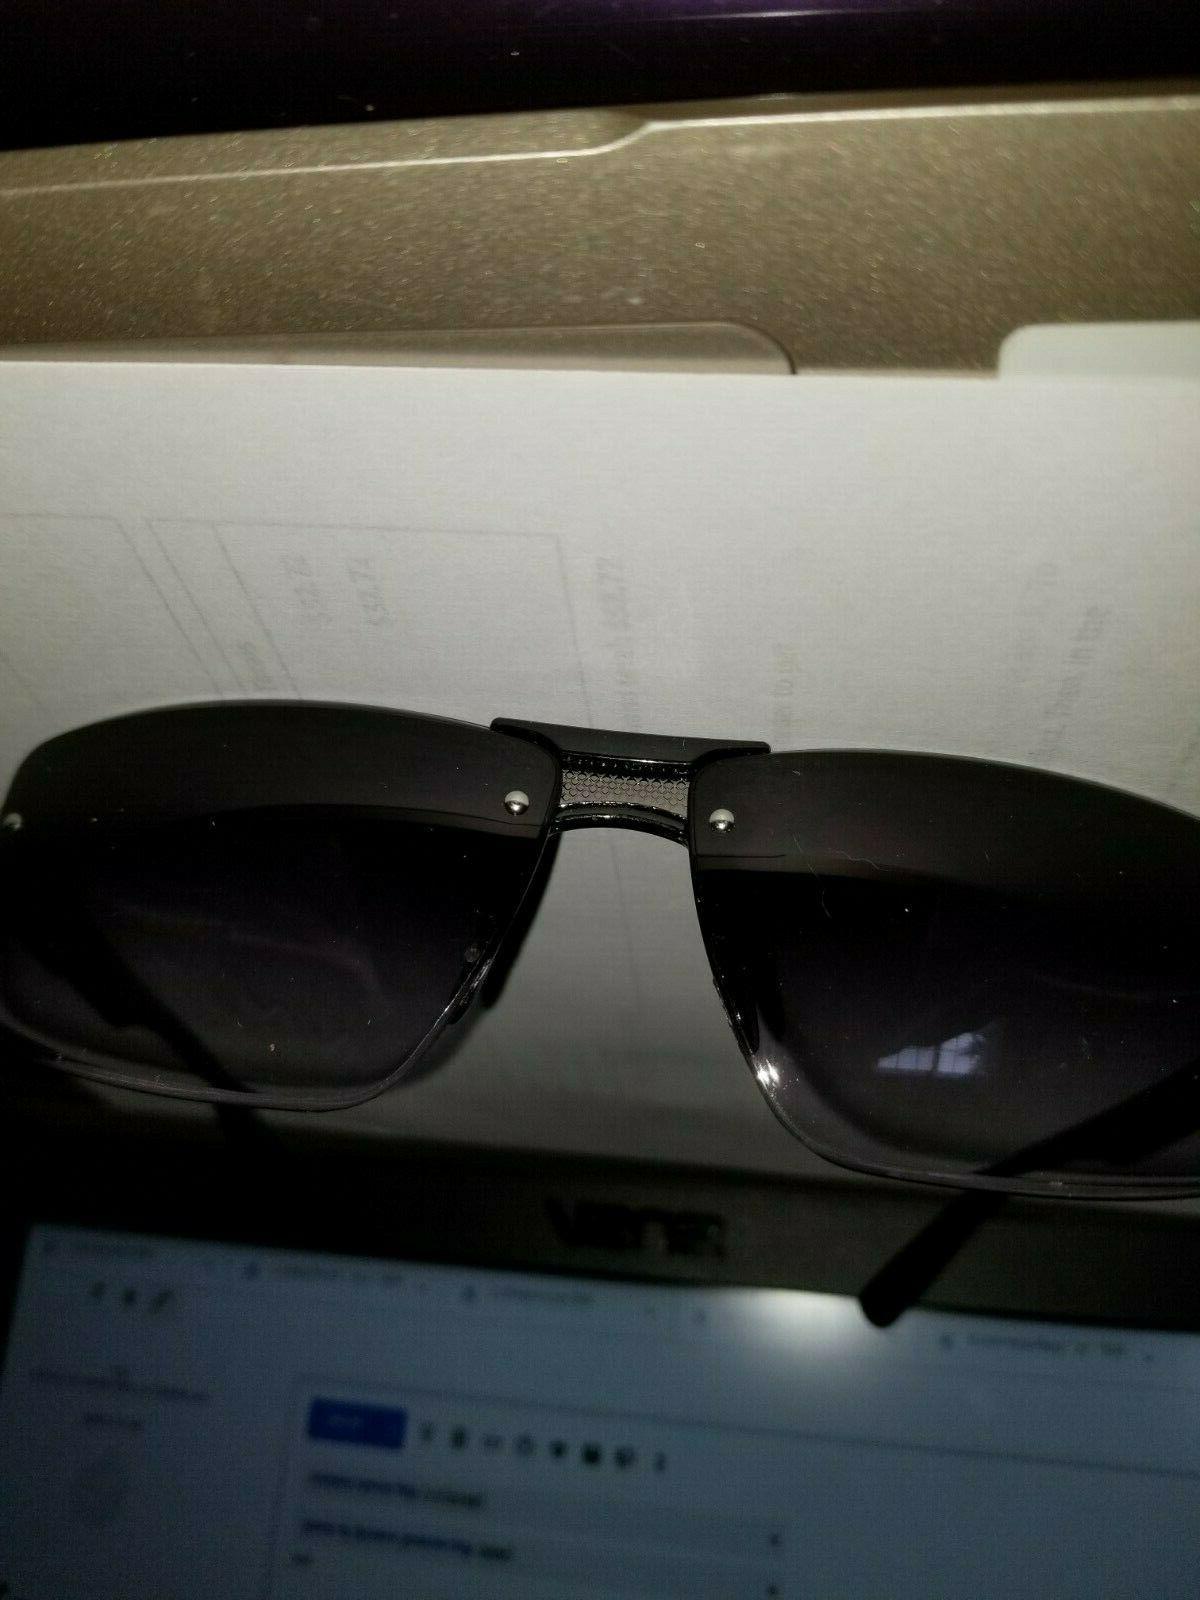 new dg eyewear mens fashion designer sunglasses